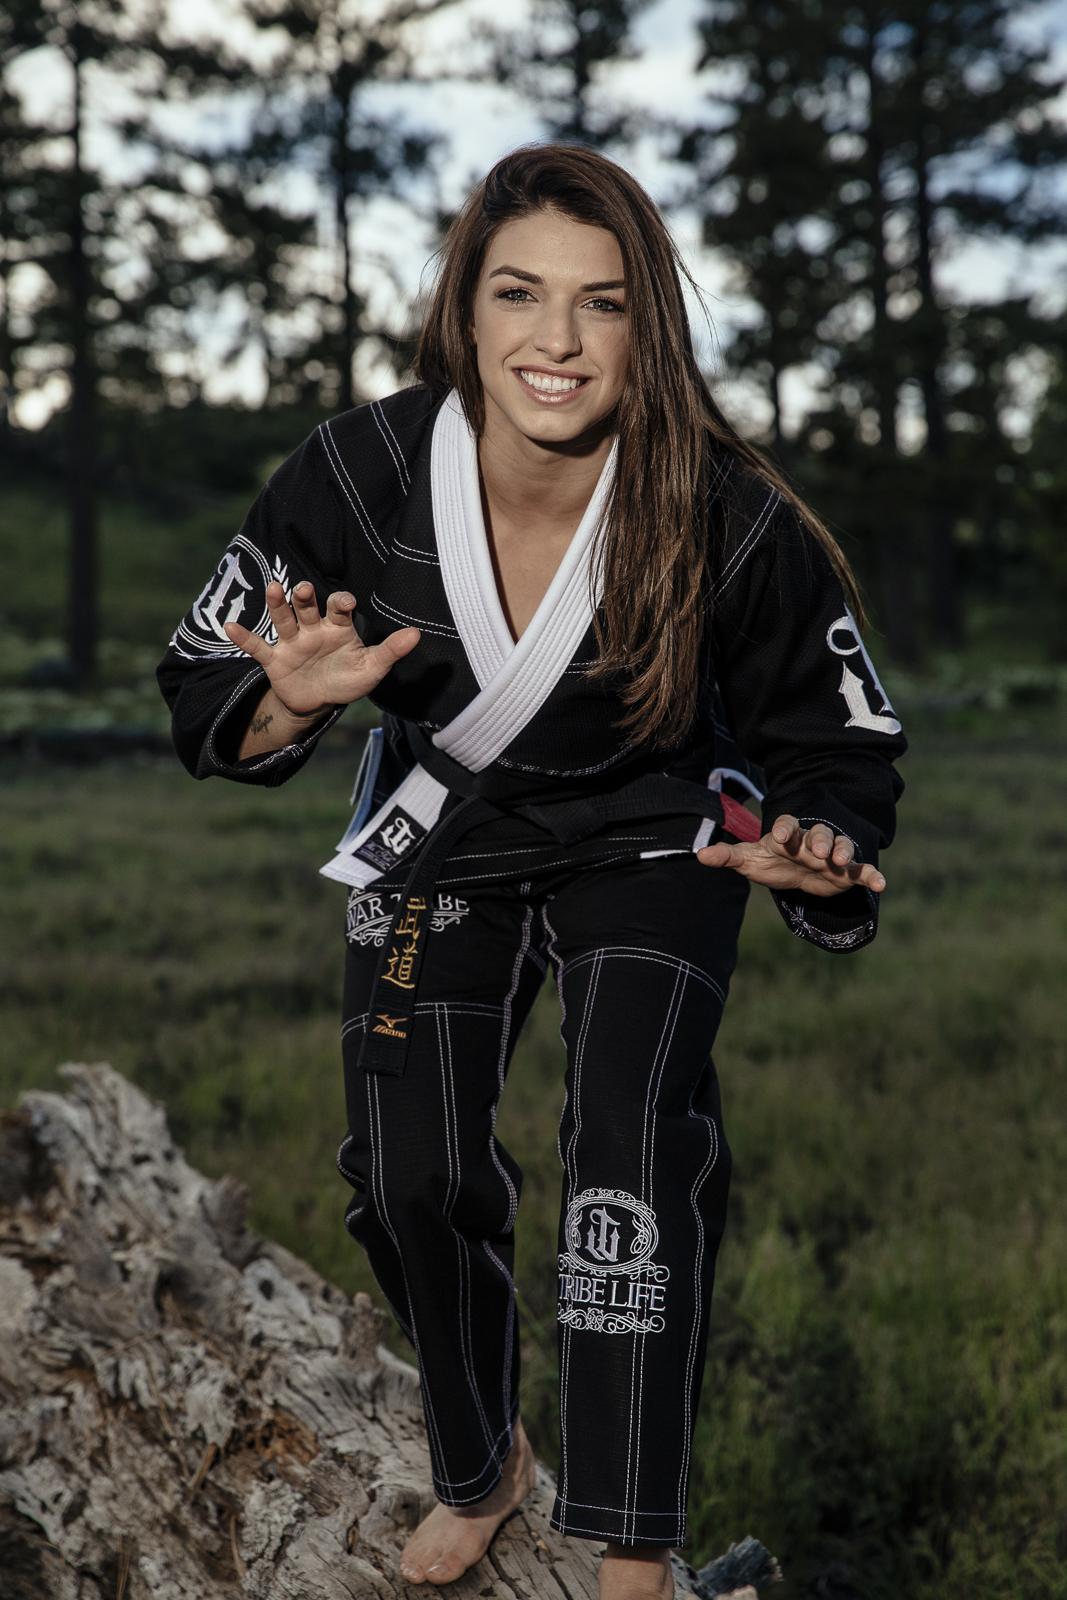 WAR TRIBE GEAR LIONESS ブラック|女性用ブラジリアン柔術衣(柔術着)